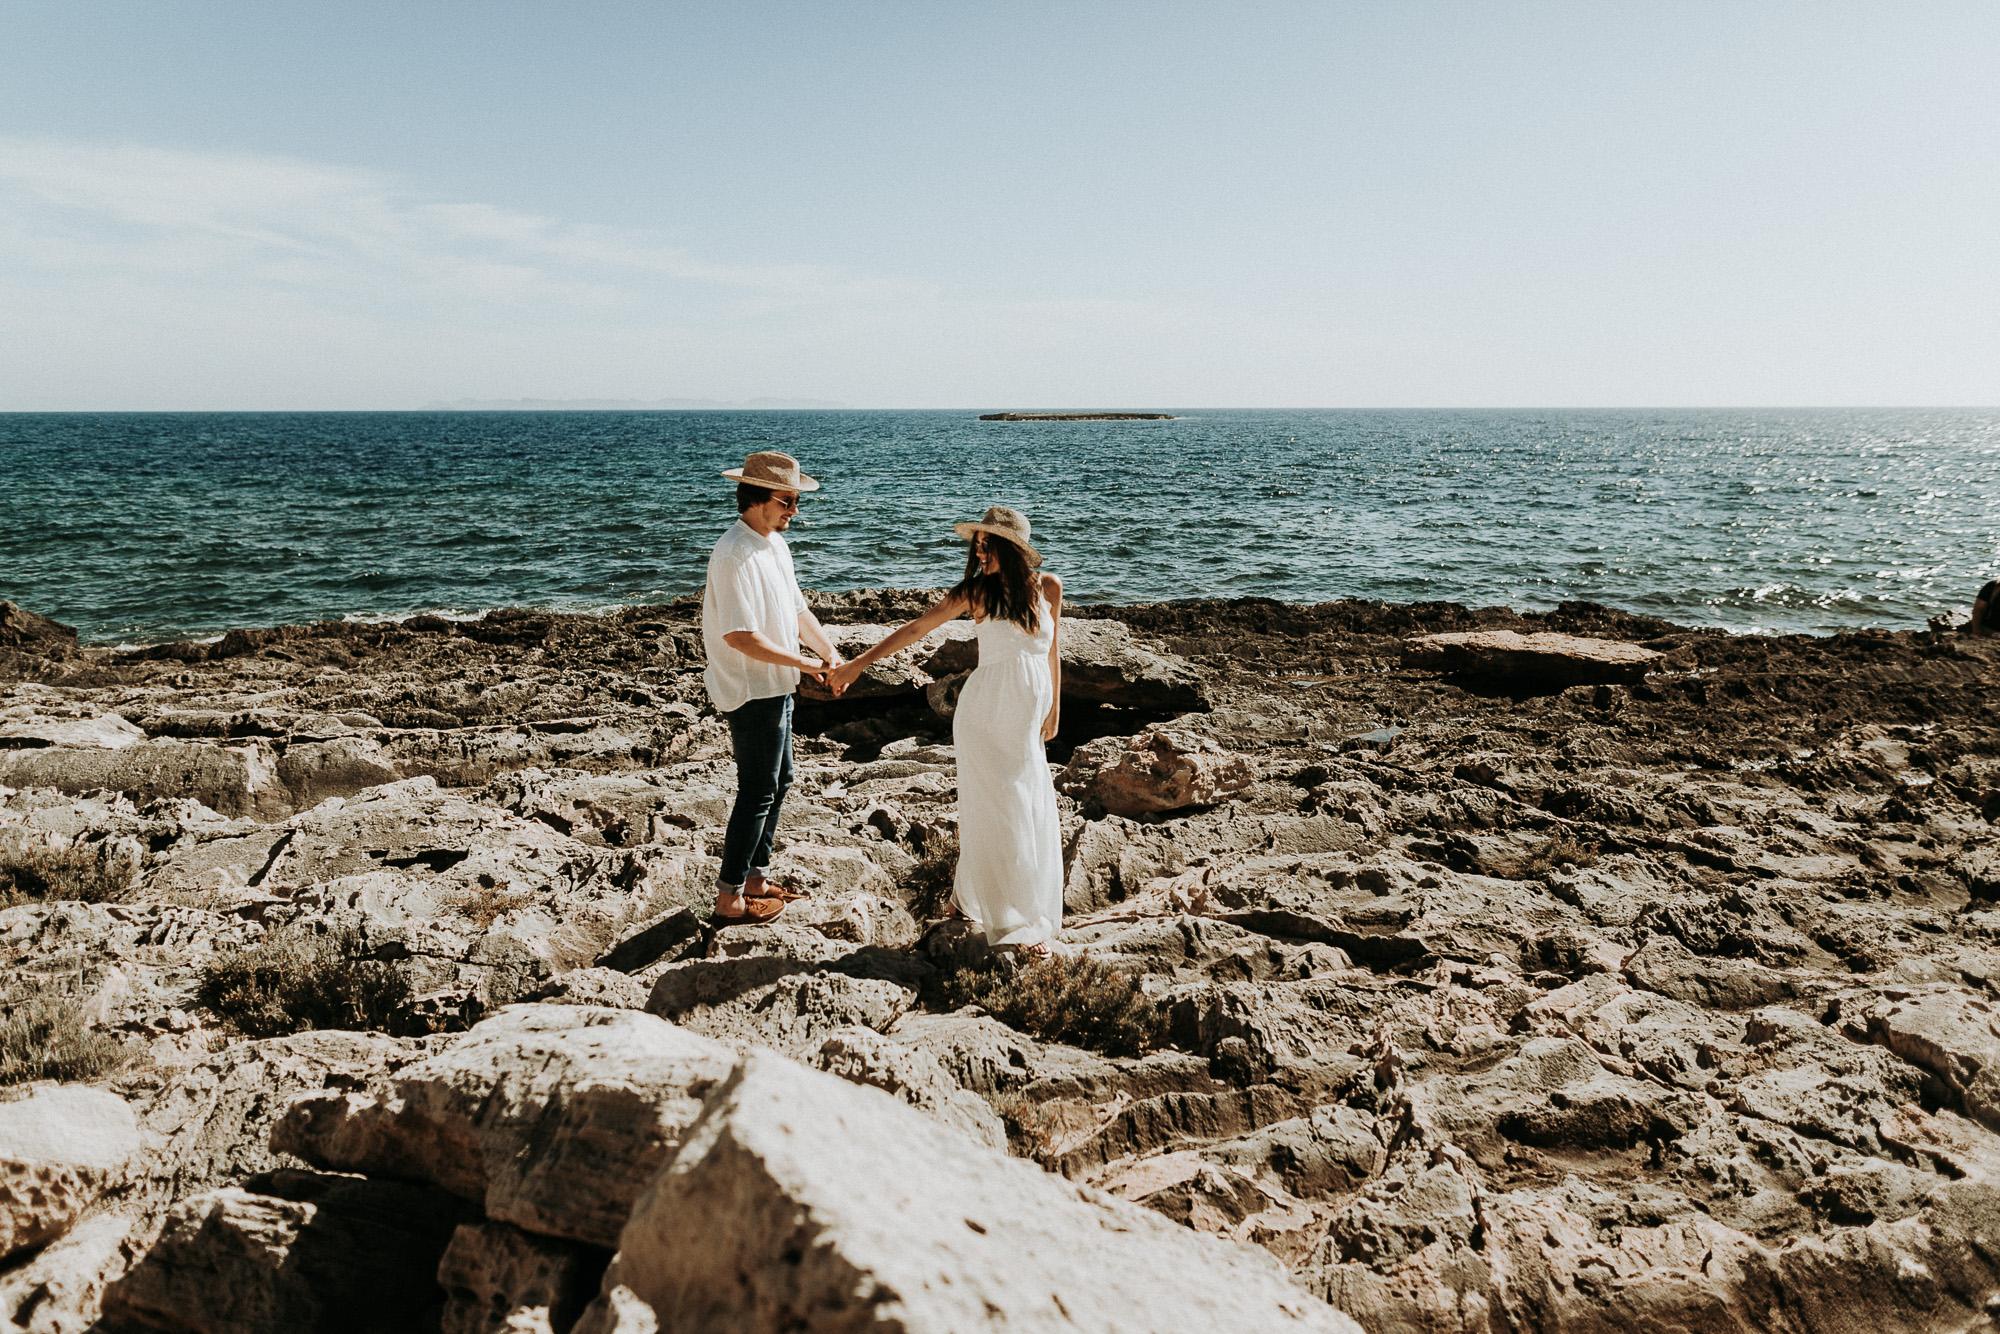 DanielaMarquardtPhotography_wedding_elopement_mallorca_spain_stjordi_sessalines_marinaandxavi345